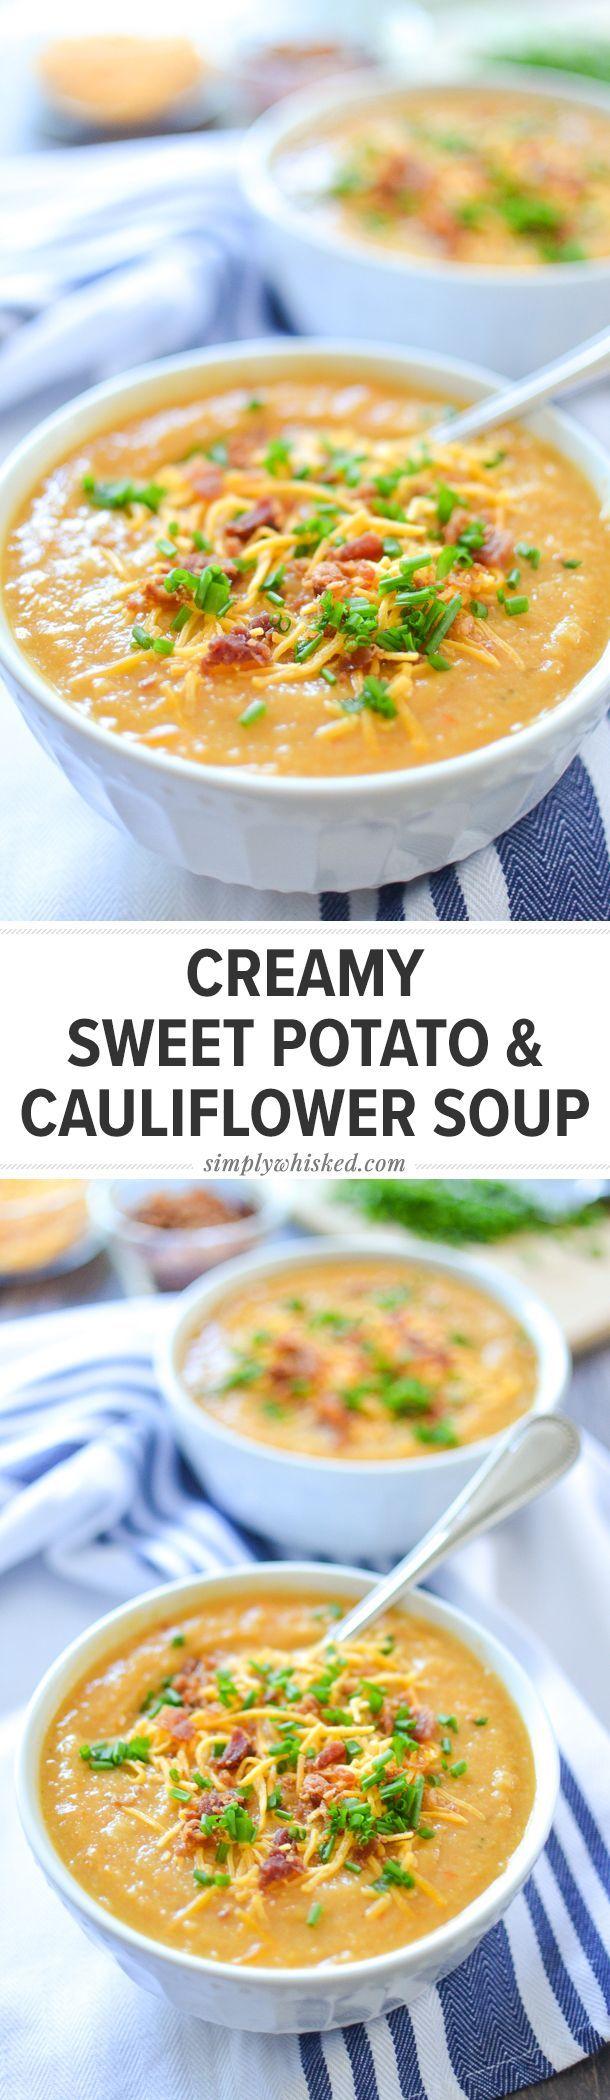 Creamy Sweet Potato & Cauliflower Soup | @Simply Whisked | Melissa Belanger